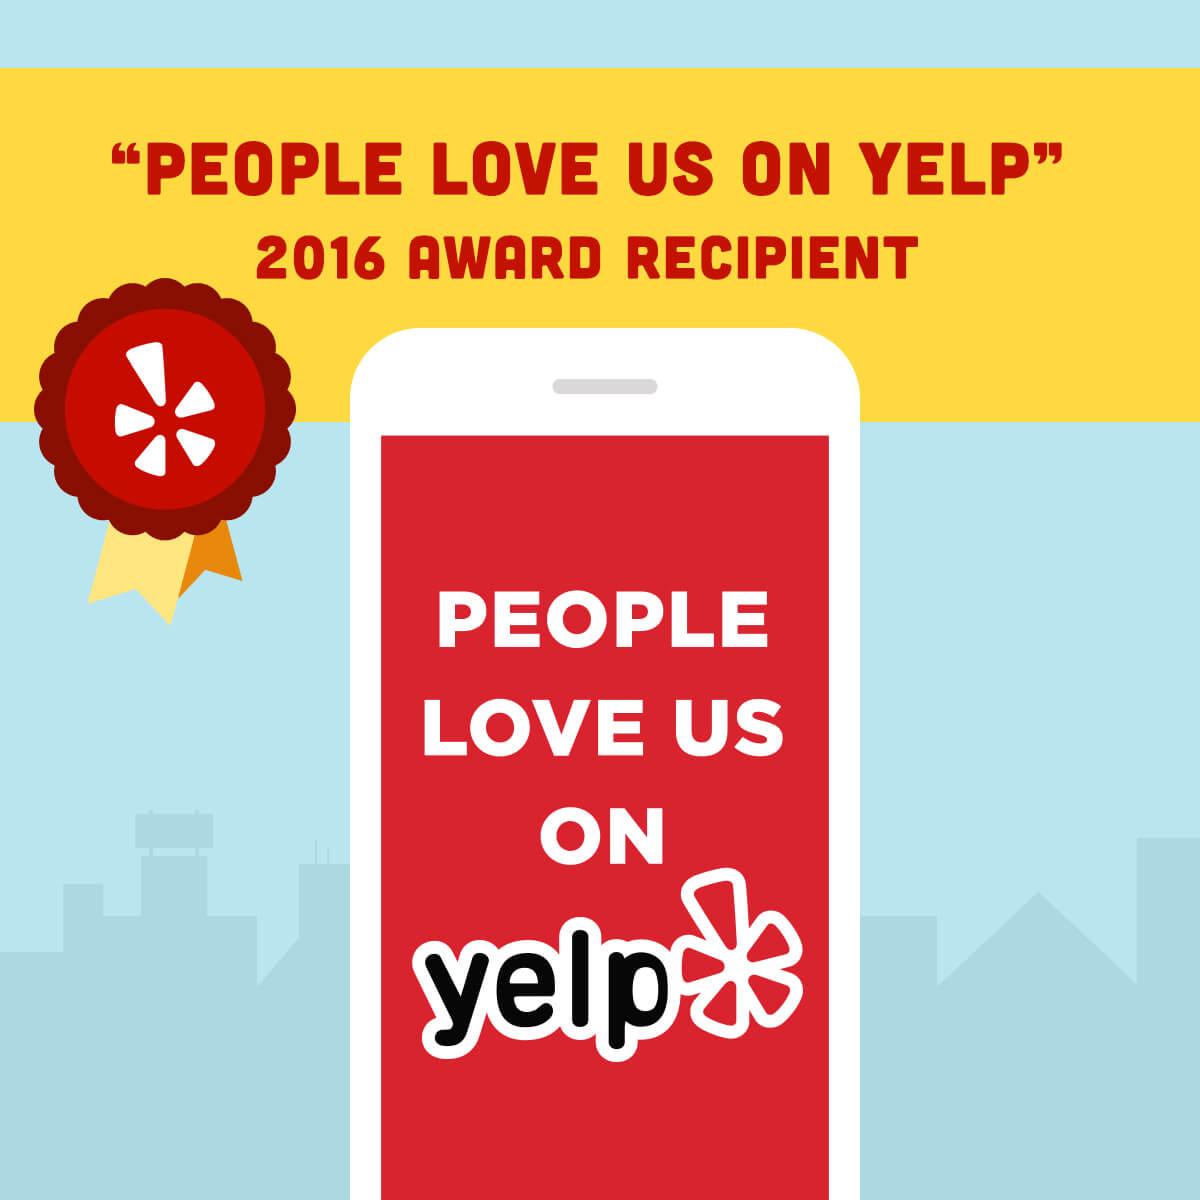 People Love Us On Yelp 2016 Award